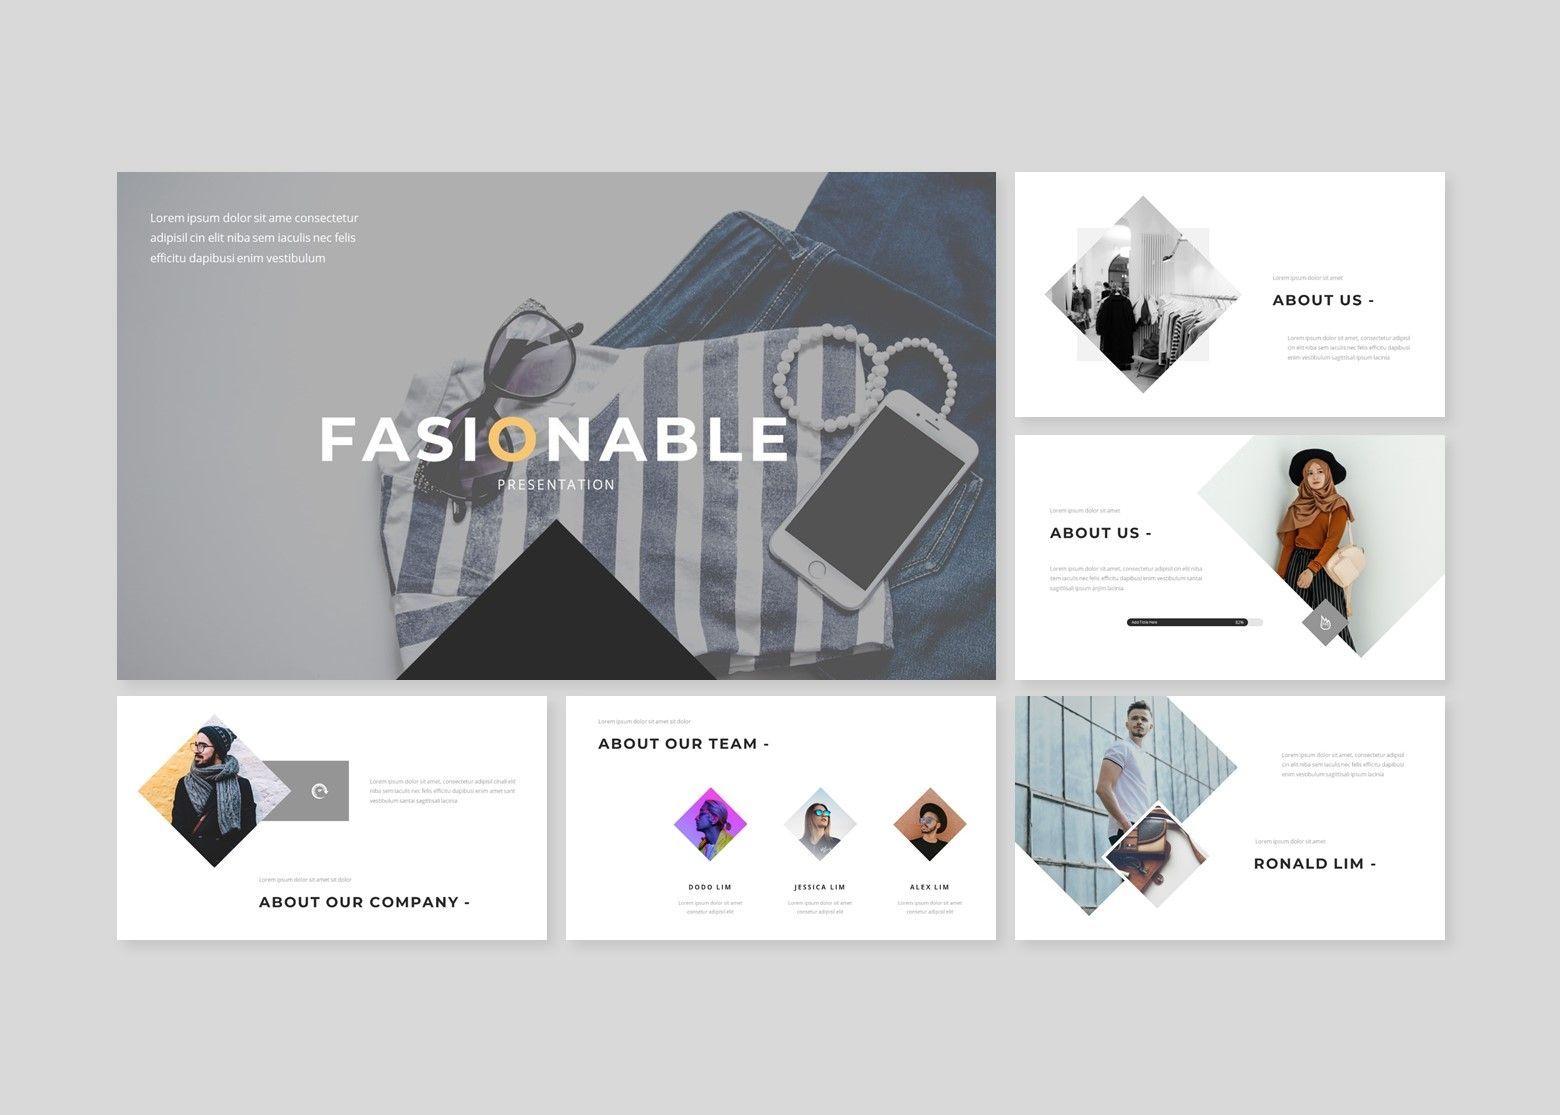 Fasionable – Creative Google Slide Business Template, Slide 2, 08642, Business Models — PoweredTemplate.com